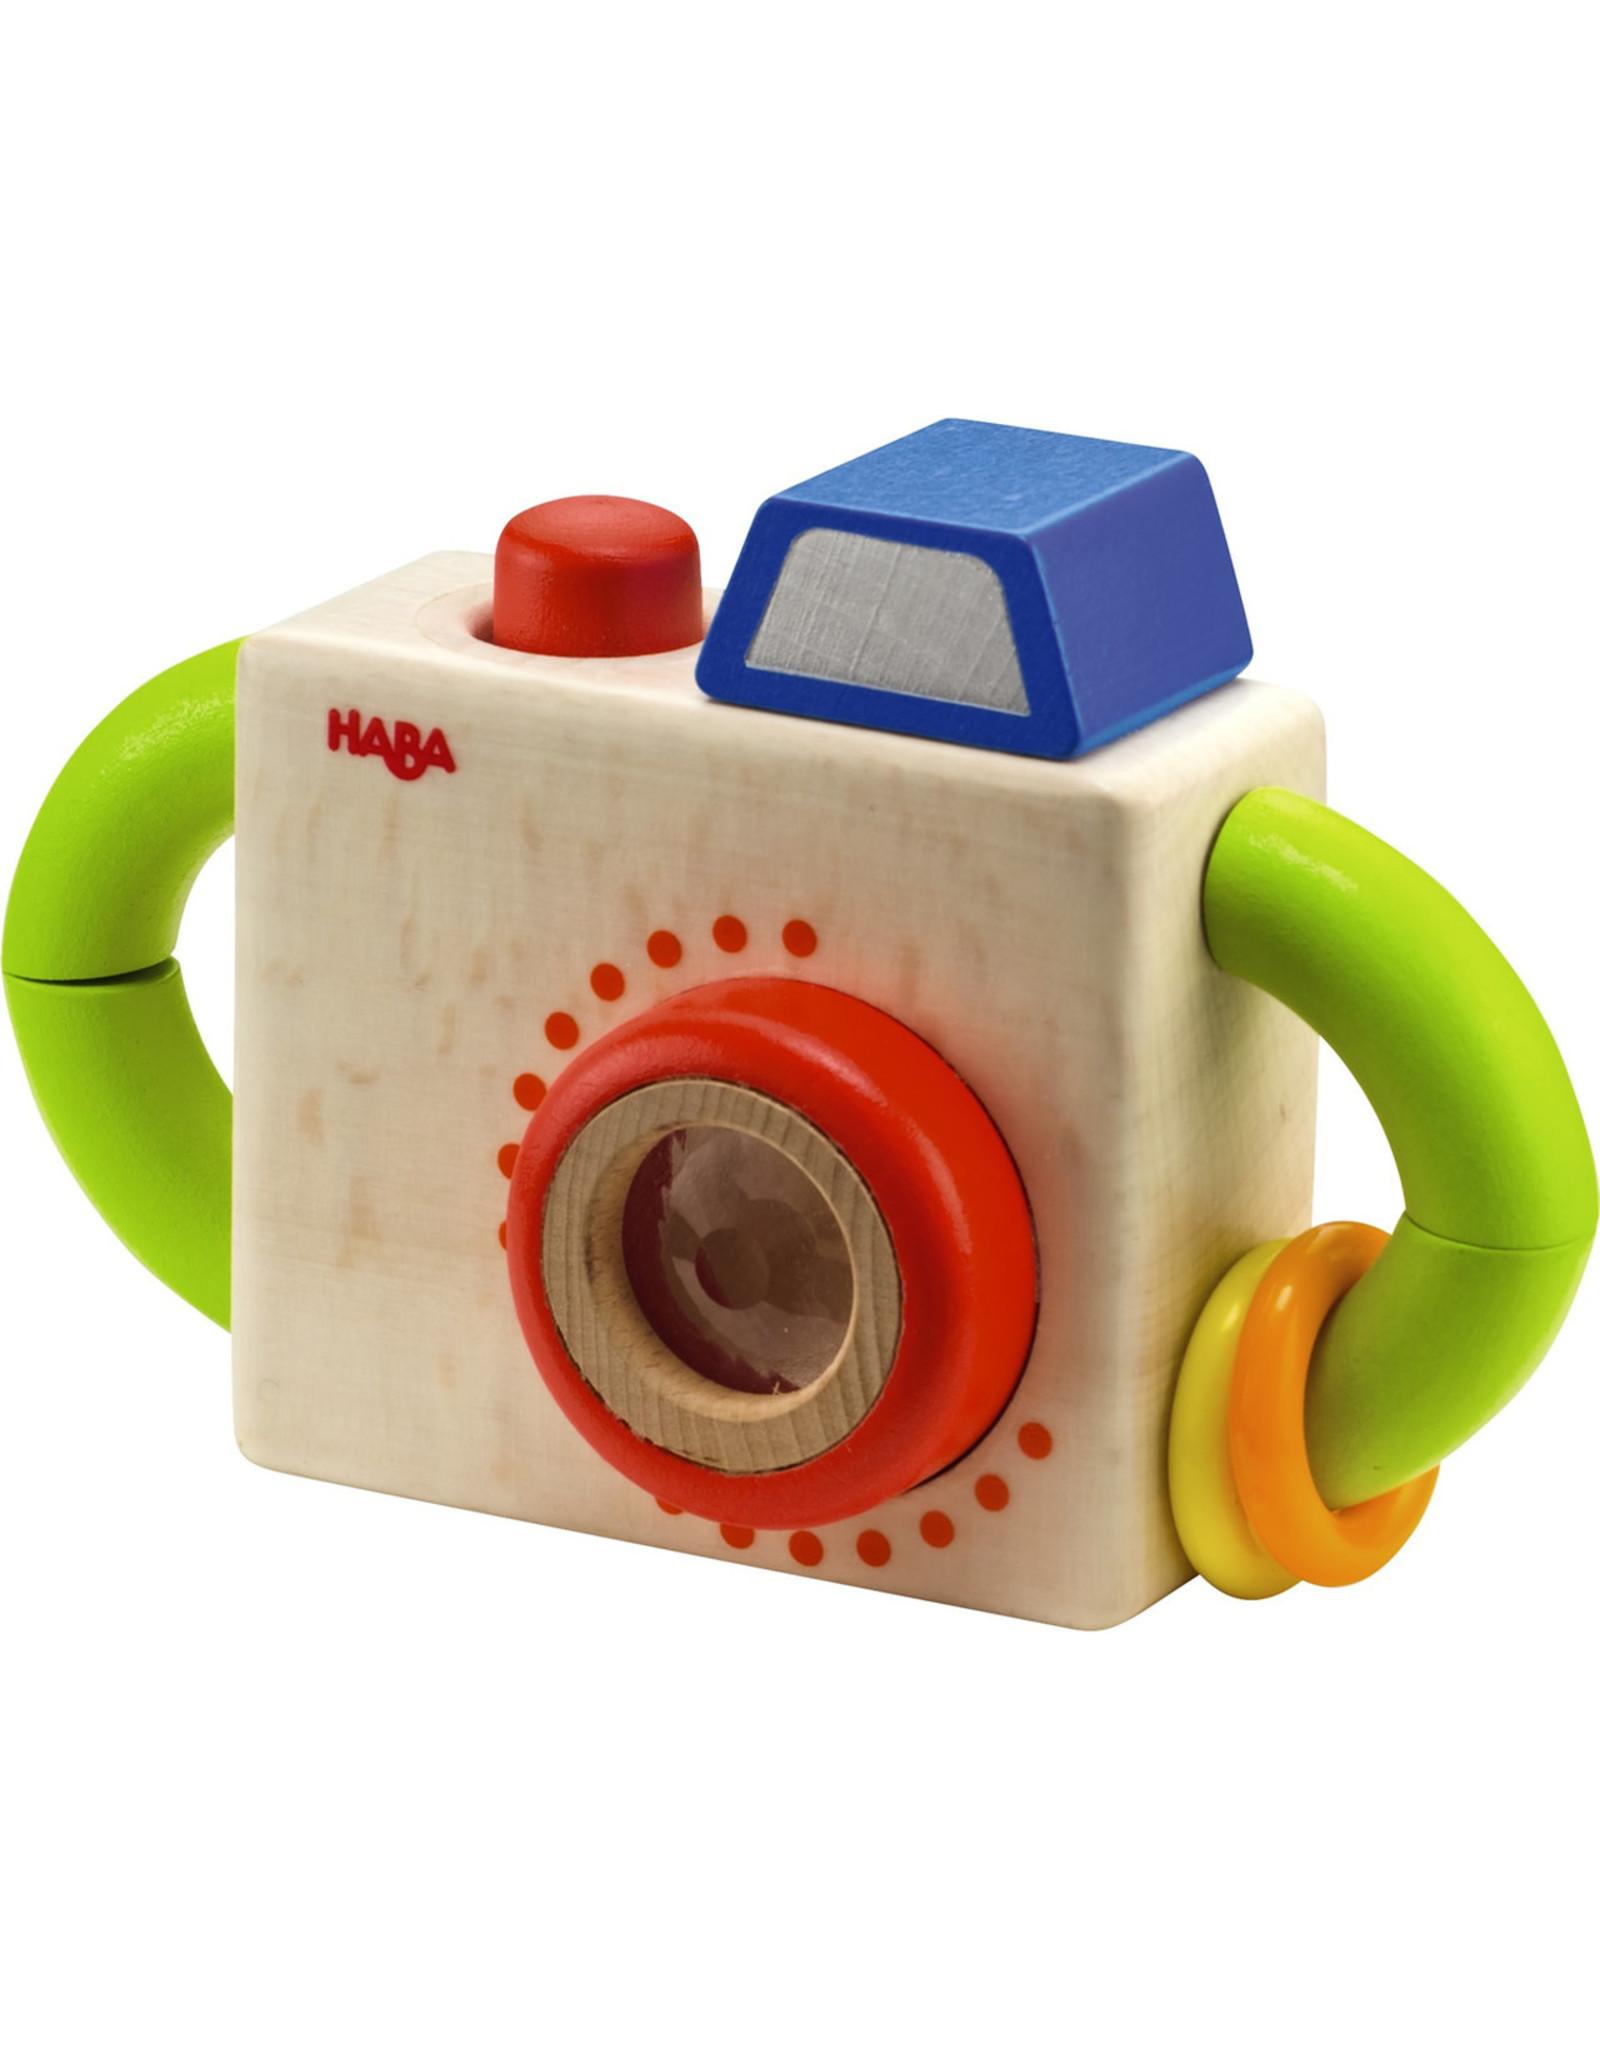 Haba Capture Fun Camera